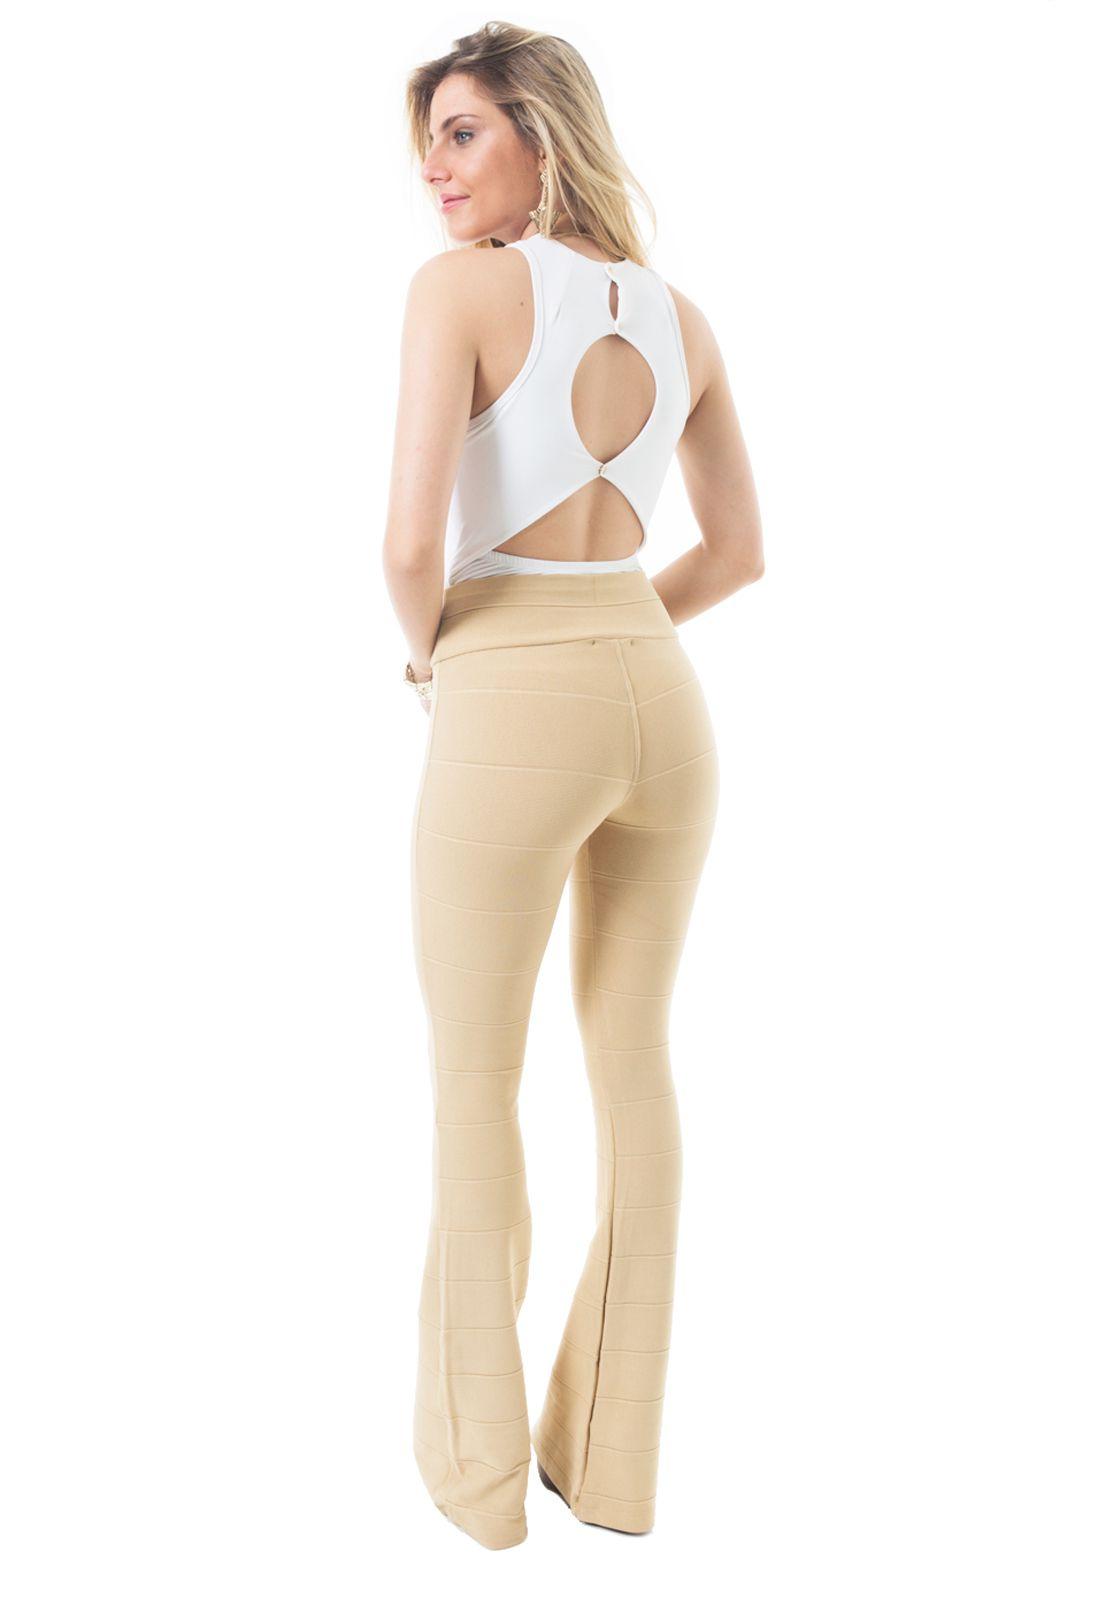 Calça Flare Bandagem Flavia Donadio Beachwear Nude